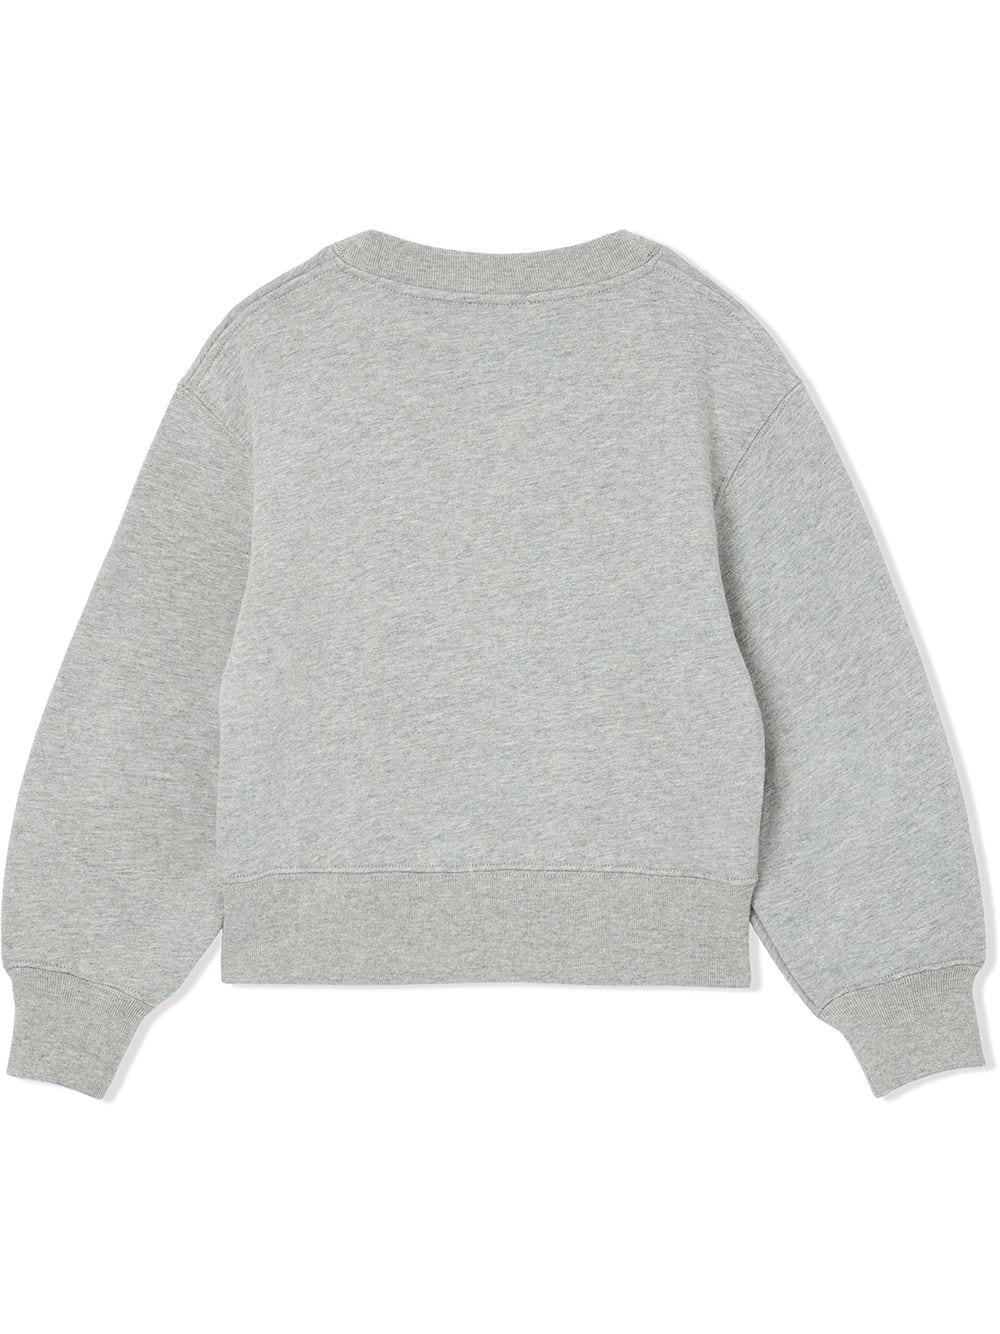 Sweatshirt Burberry kids  BURBERRY KIDS   -108764232   8041214131638K